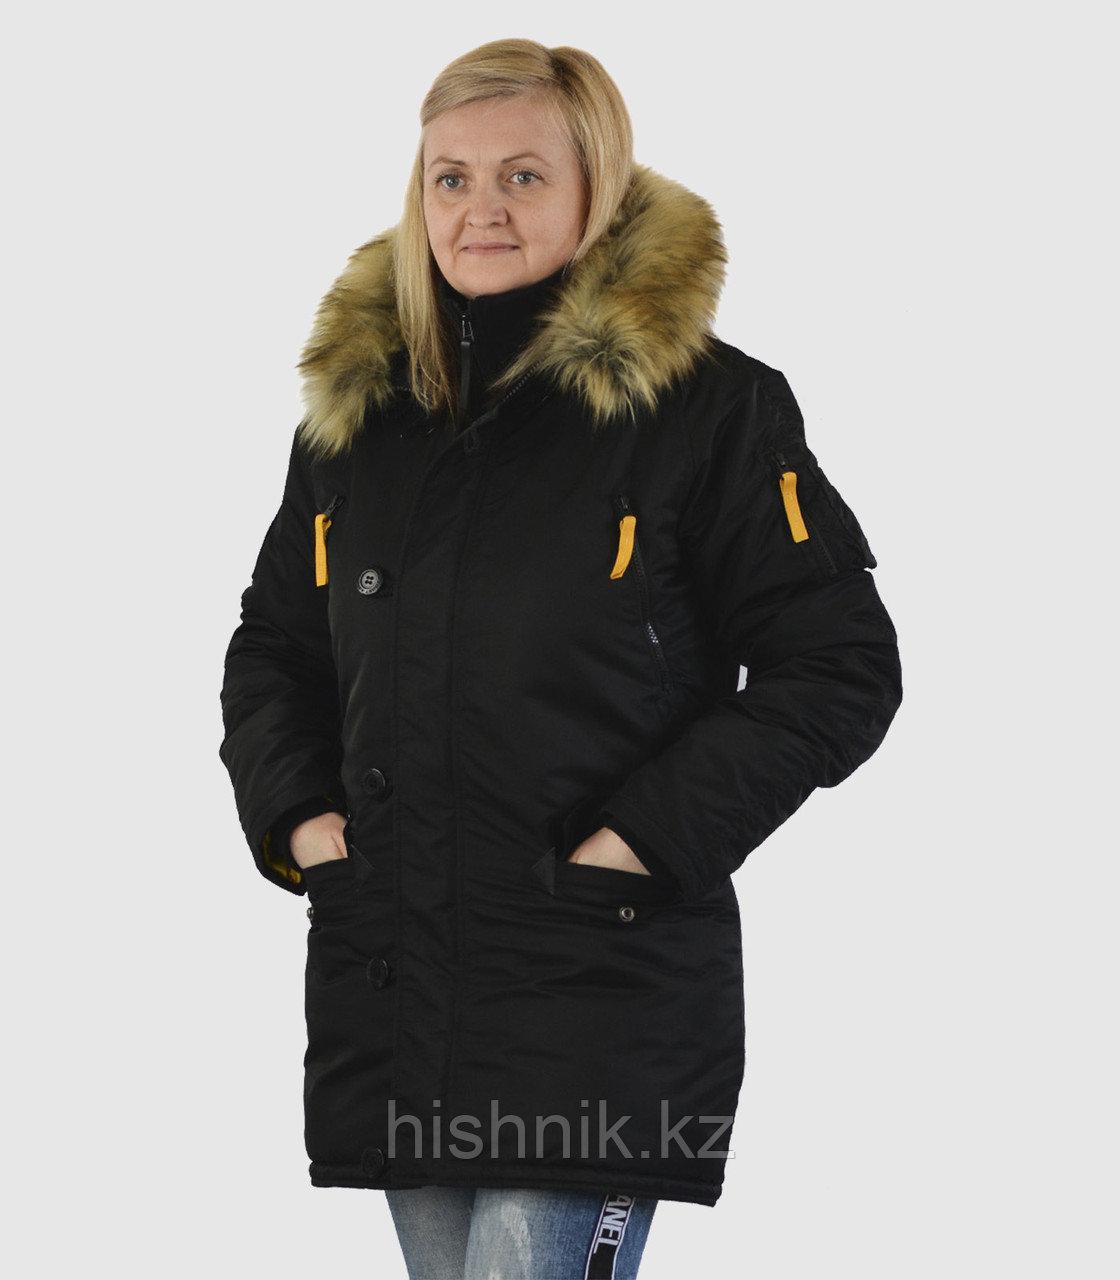 Куртка женская HUSKY WOMAN'S BLACK/YELLOW